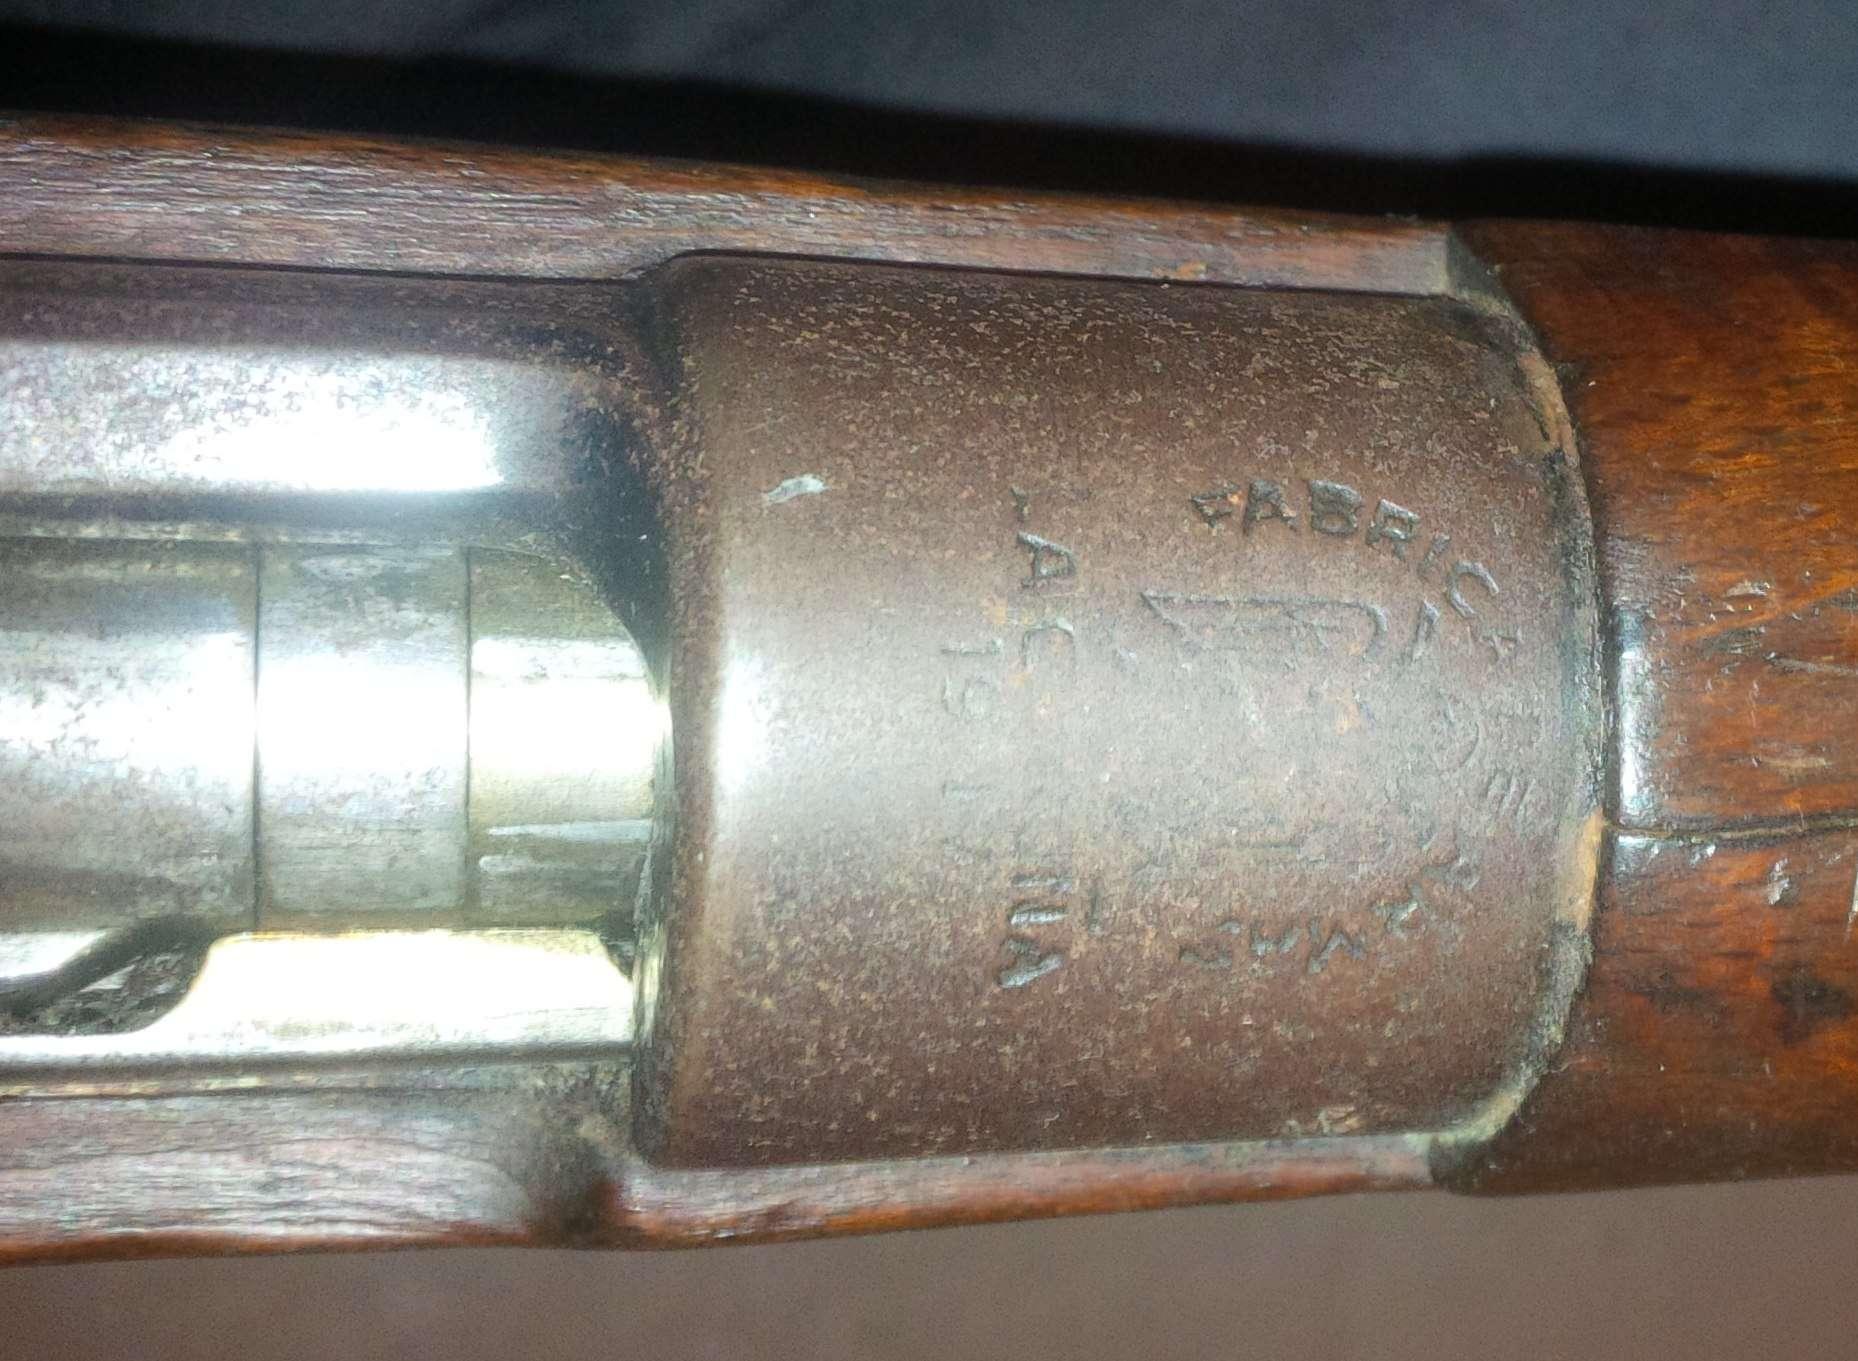 Fusil espagnol 1917, neutra allemande F610